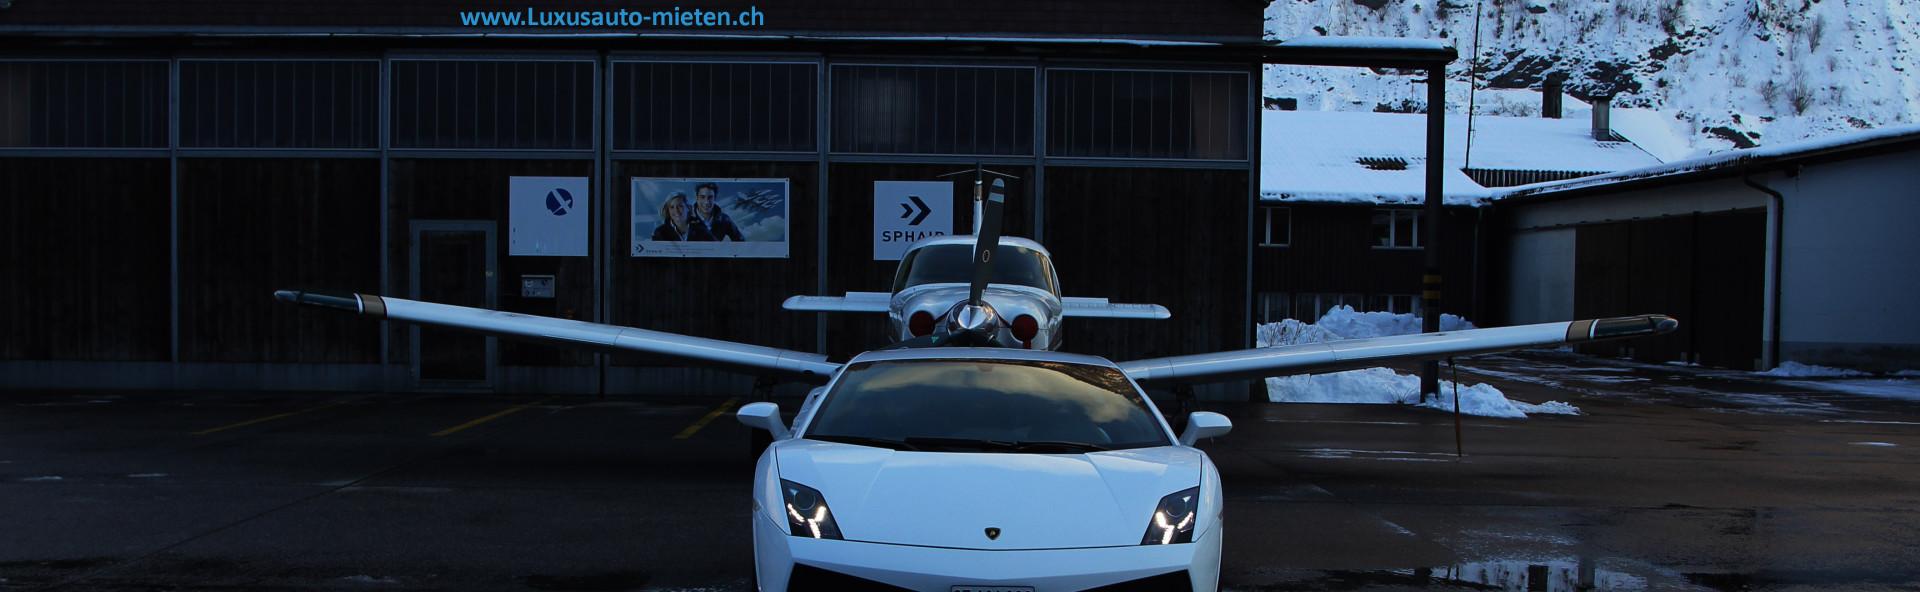 luxusauto-mieten.ch